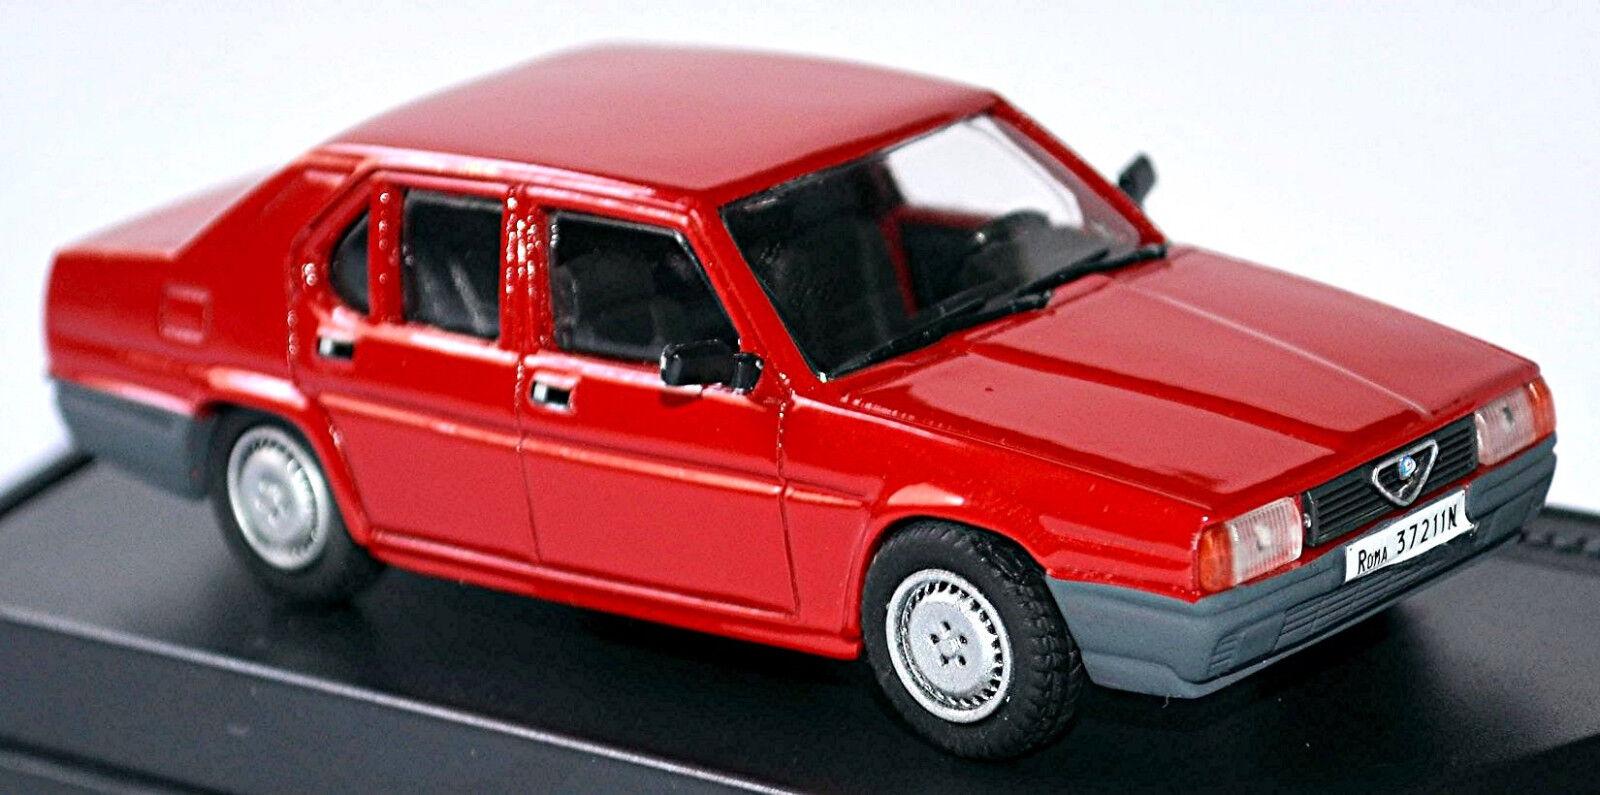 ALFA ROMEO ALFA 90 1984-87 red red 1 43 ProgettoK resina